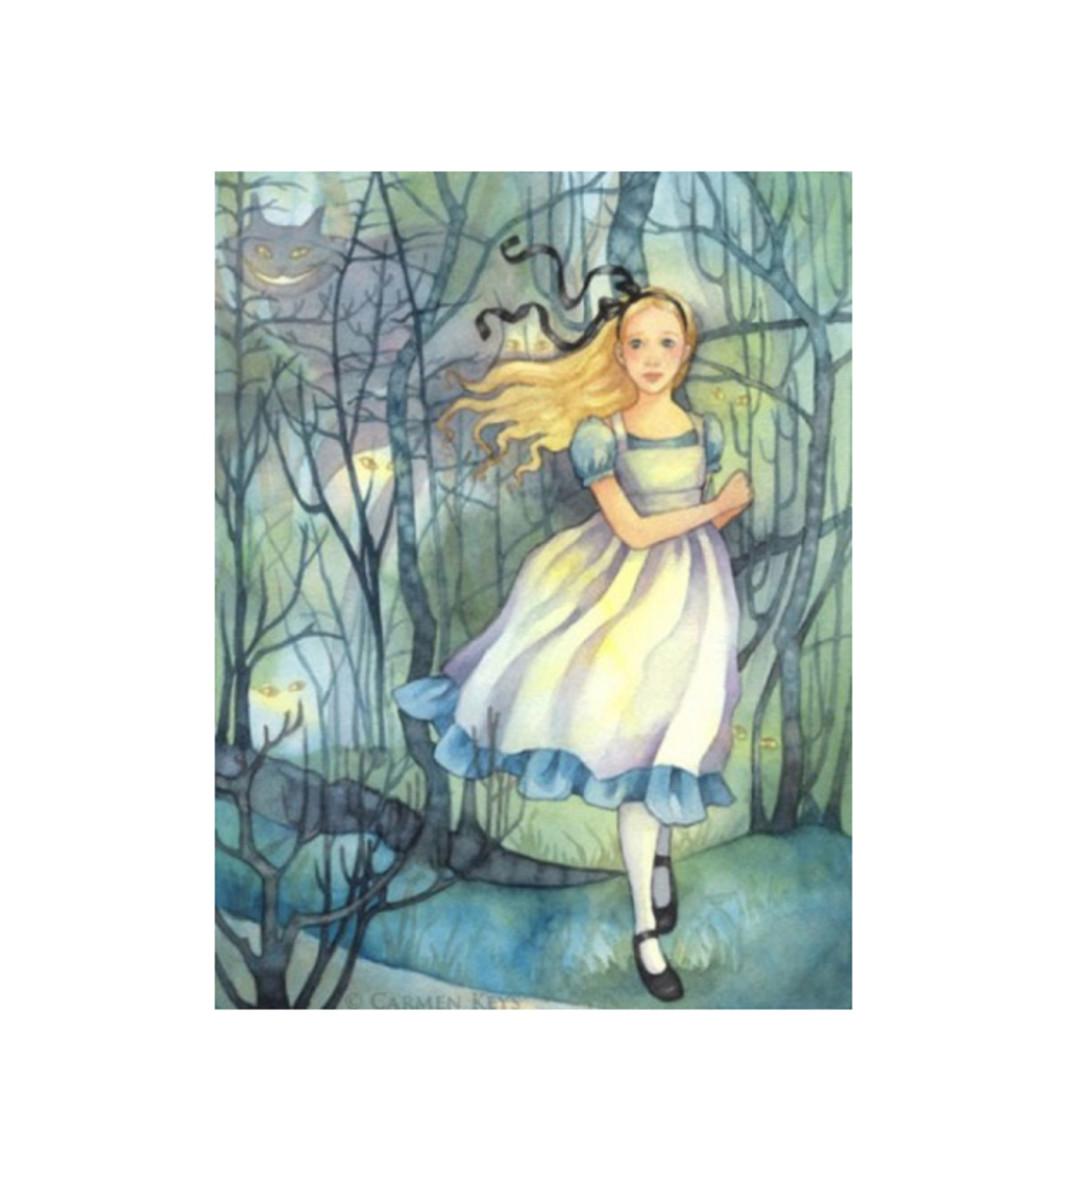 """Alice in the Tulgey Wood"" by Carmen Keys"